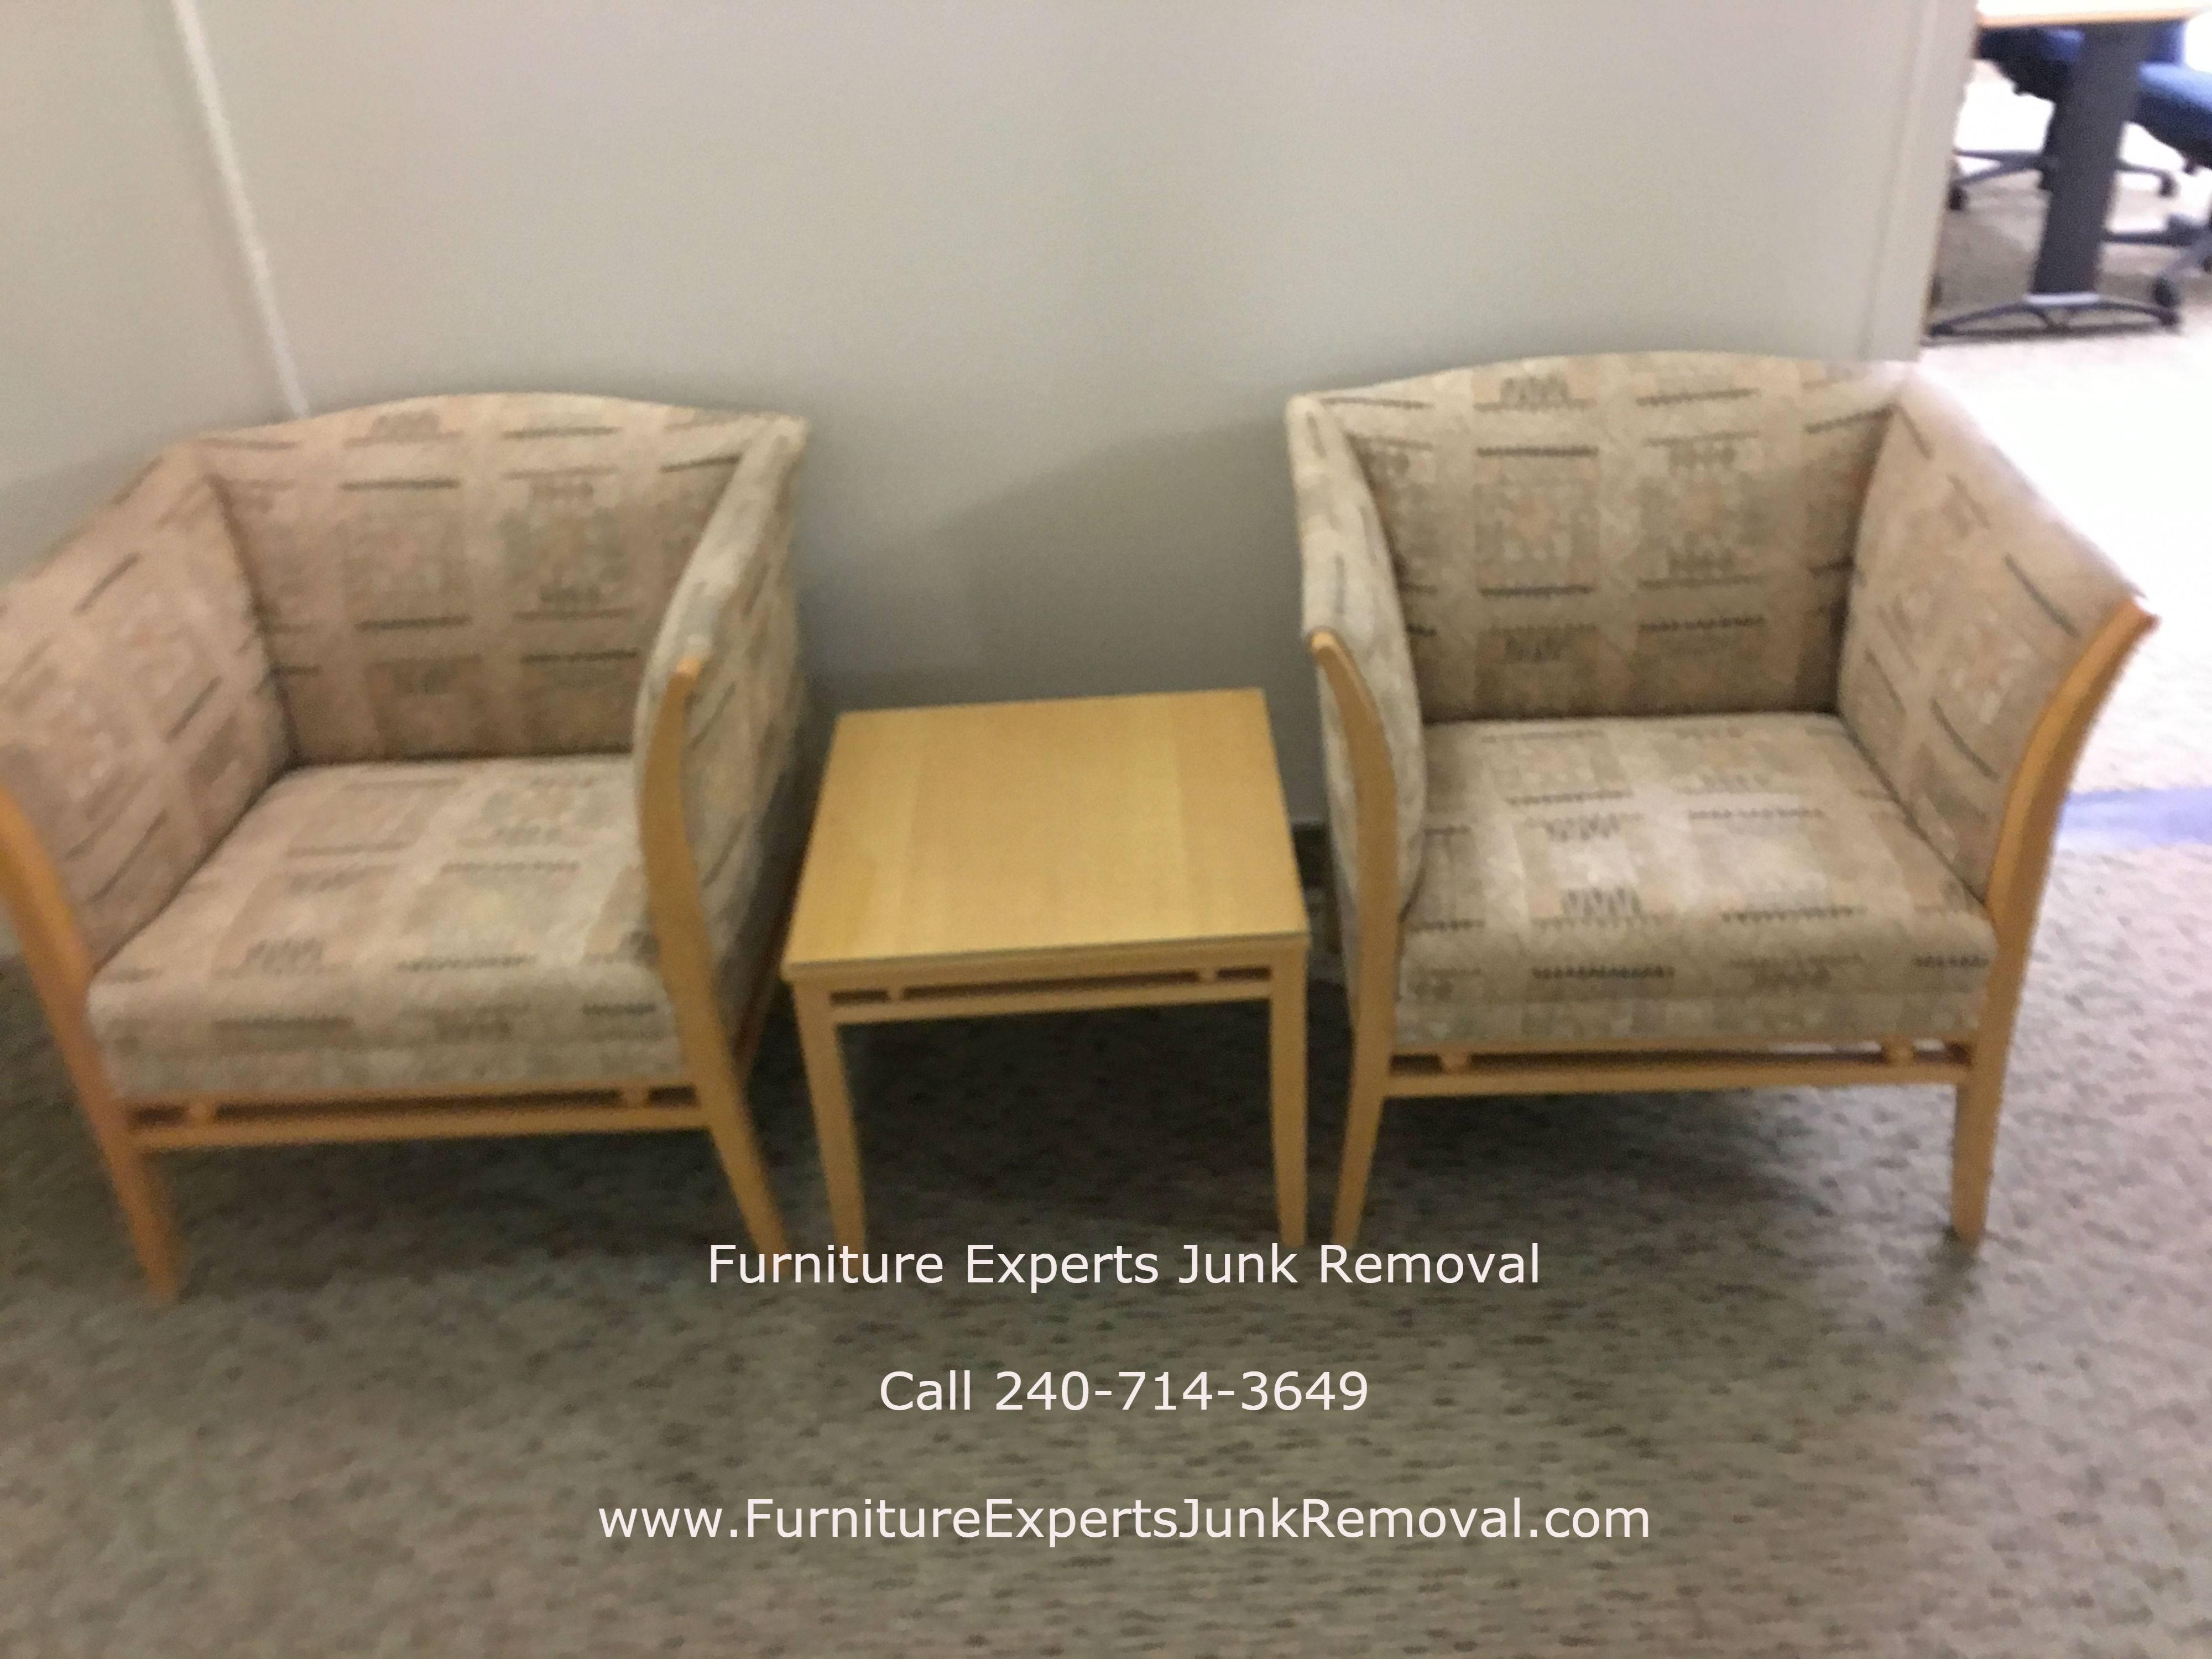 Junk office furniture removal in arlington VA